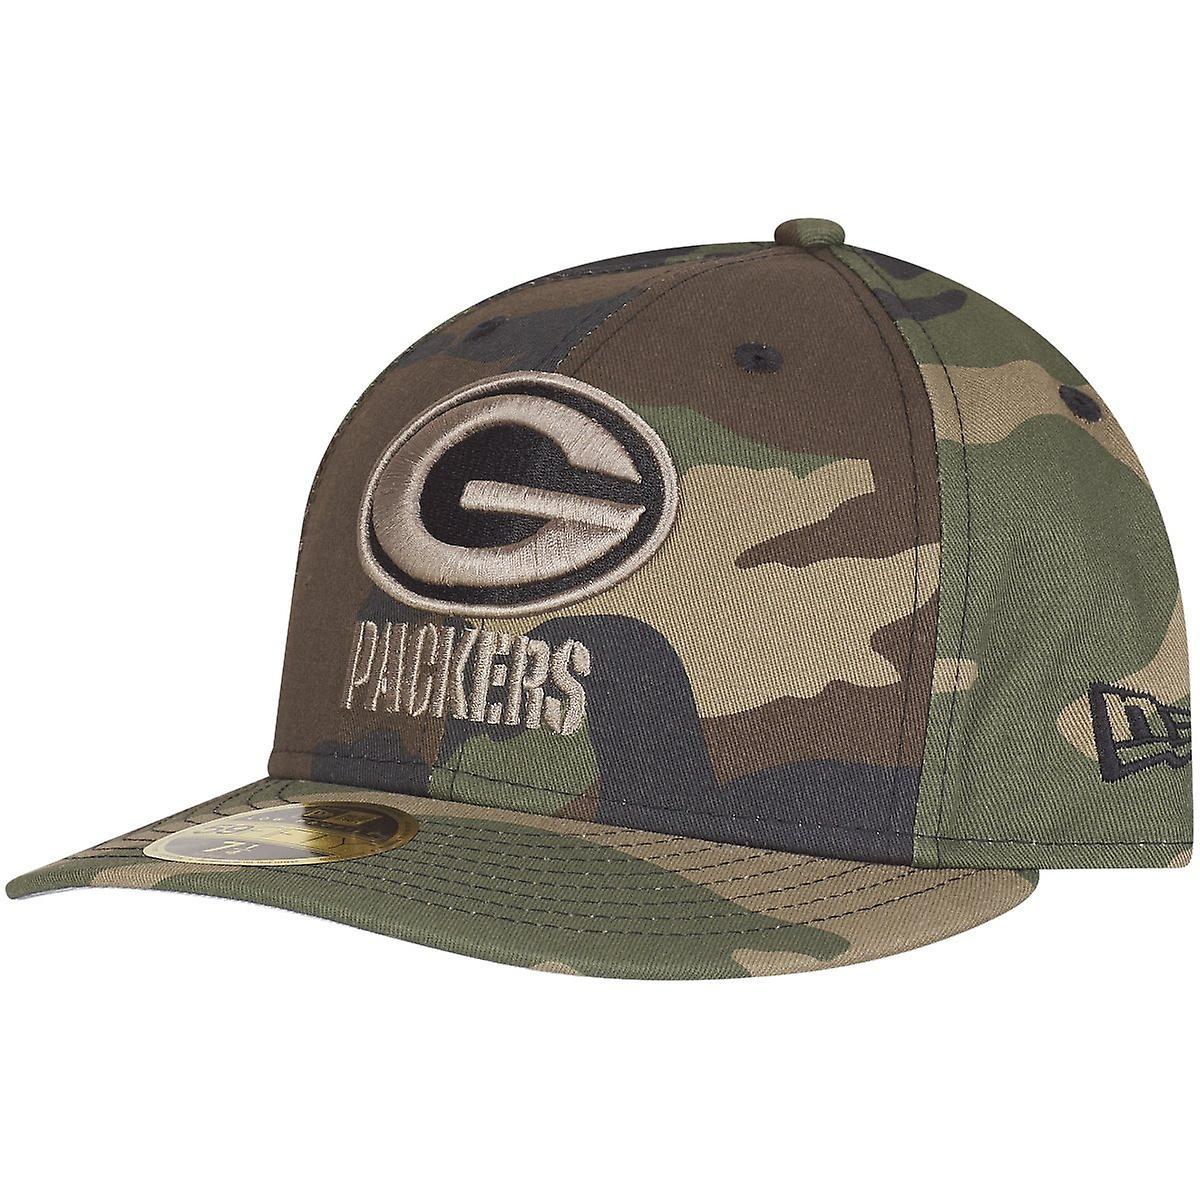 New Era 59fifty Low Profile Cap Green Bay Packers Camo Fruugo Us